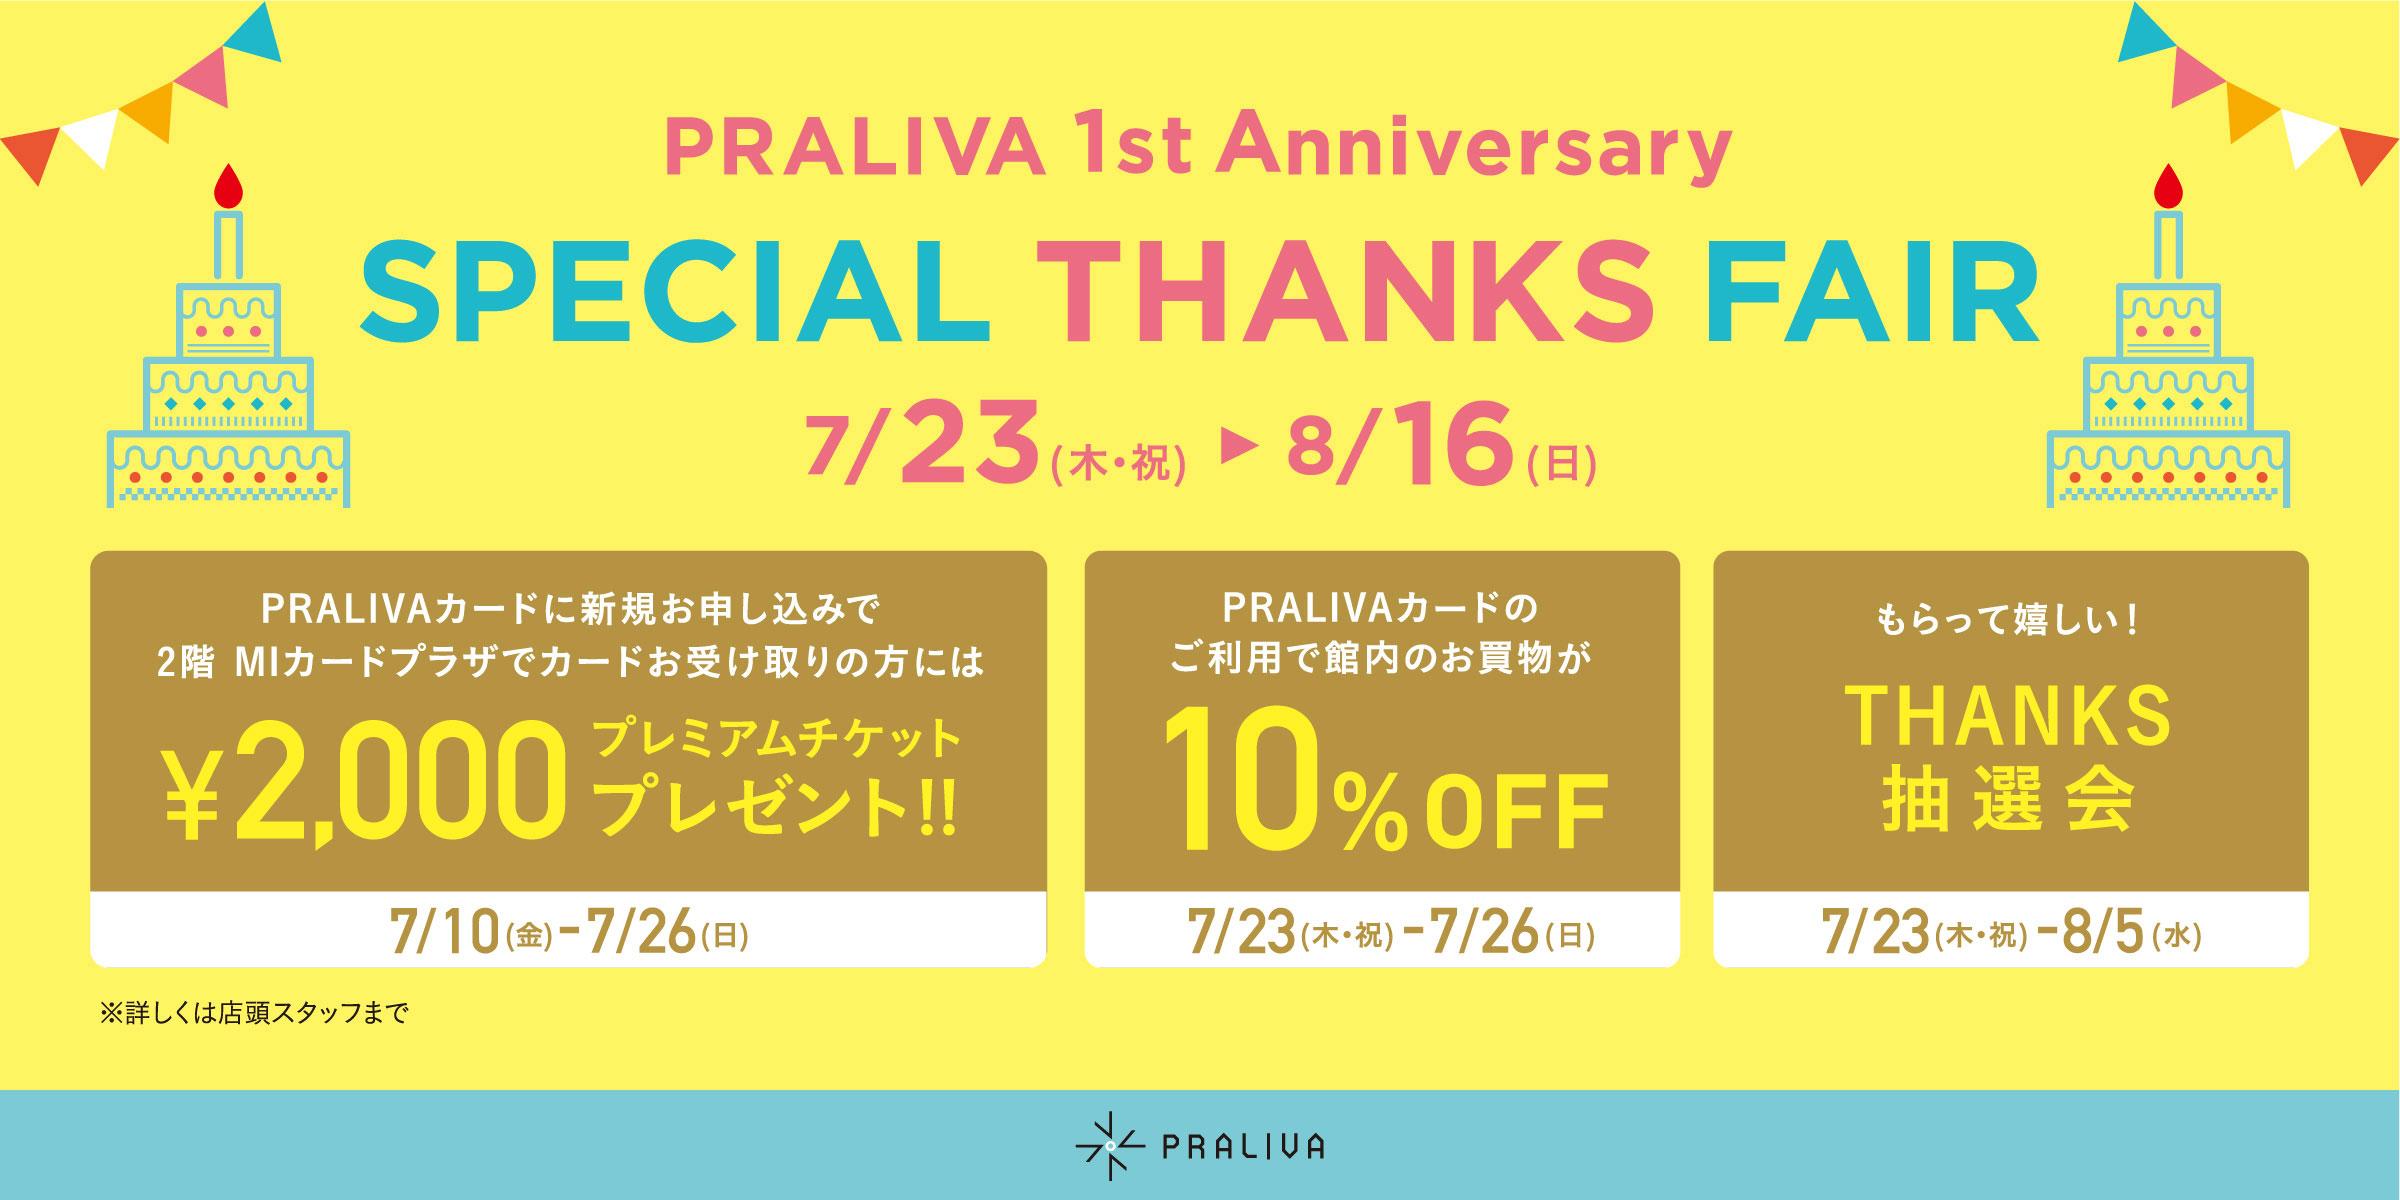 PRALIVA 1st anniversary SPECIAL THANKS FAIR